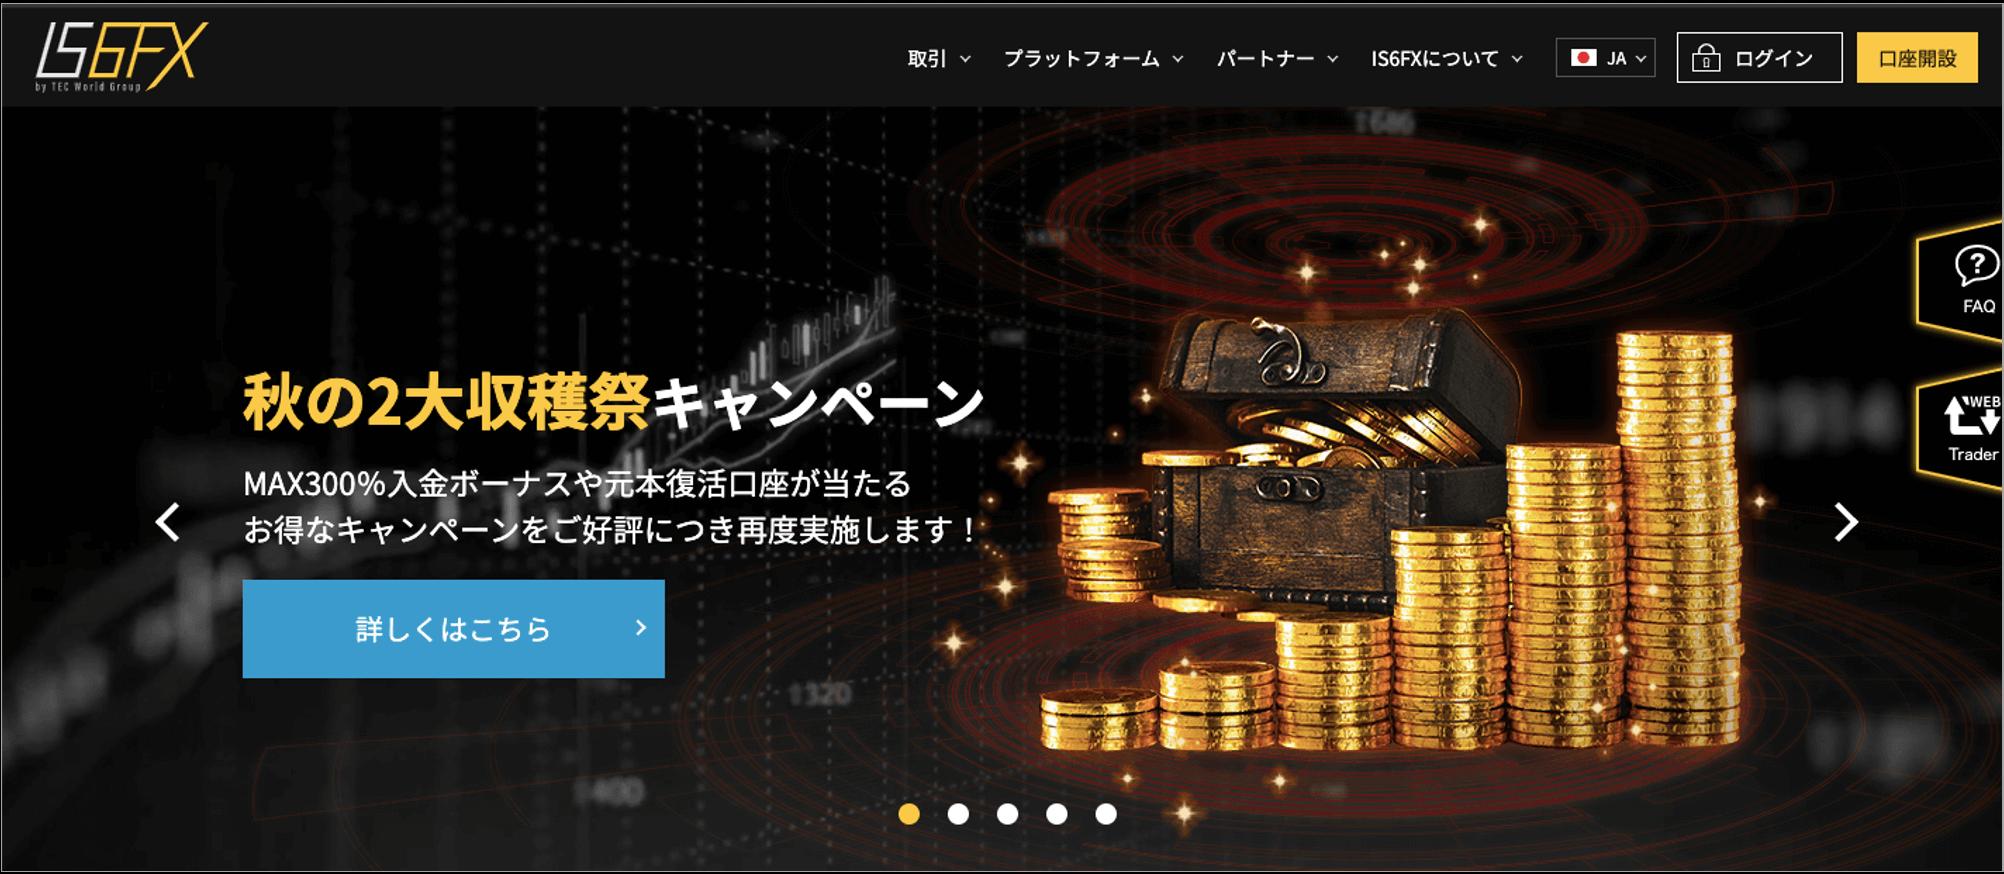 IS6FX 公式サイト画像